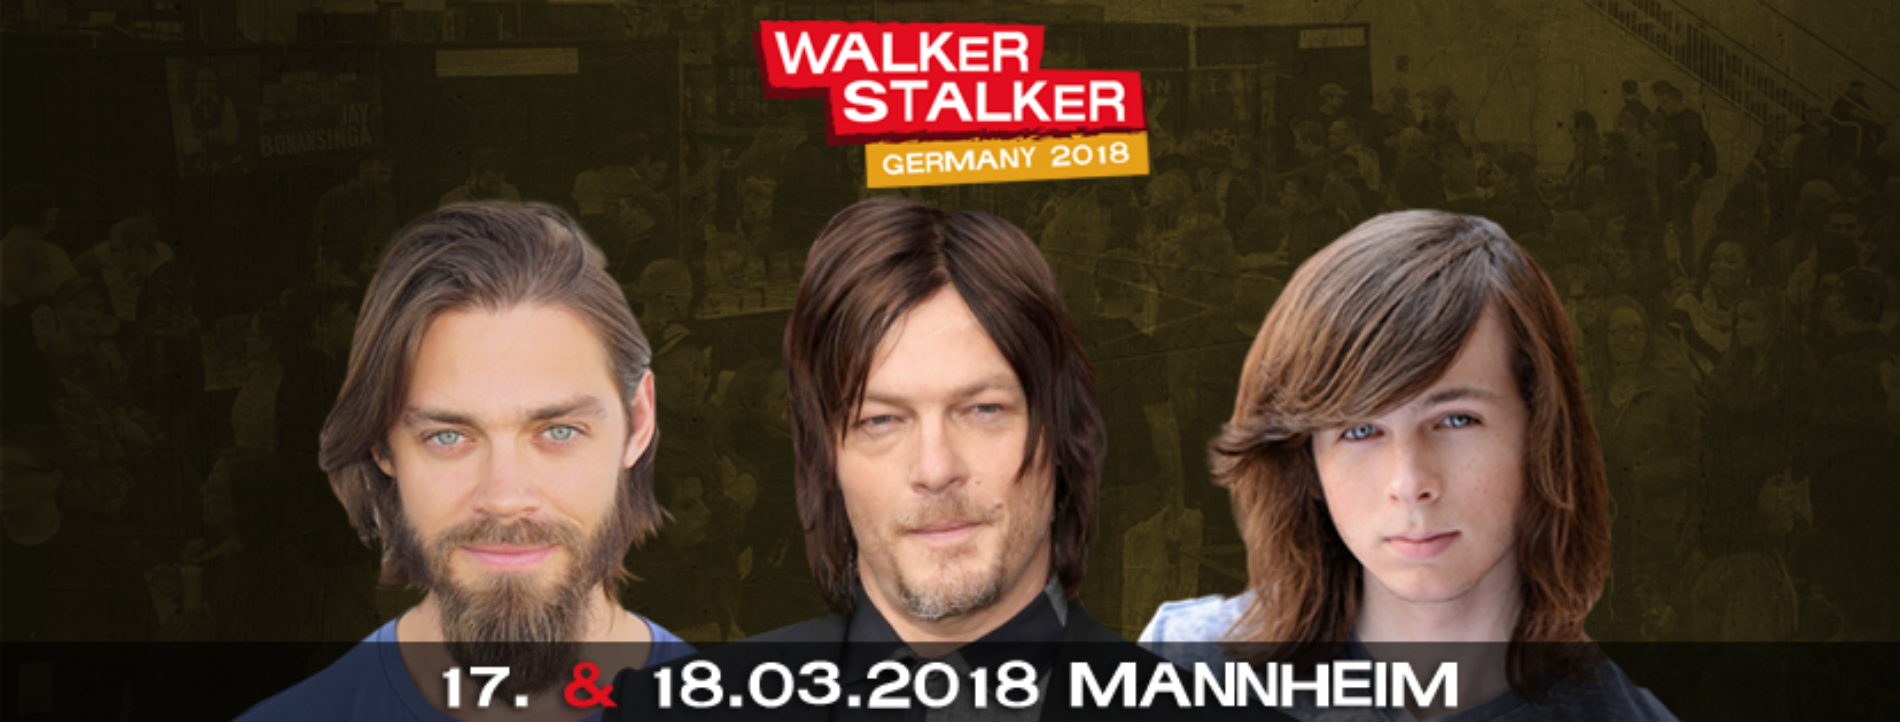 Walker Stalker Mannheim